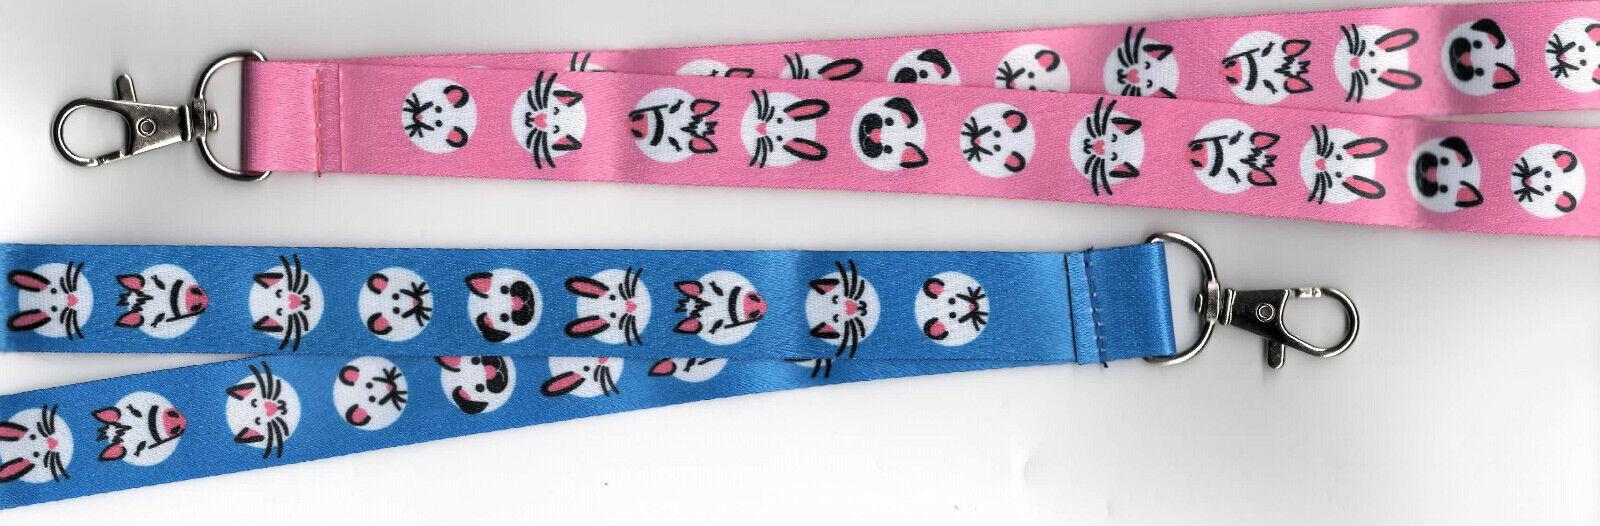 1 CUTE & CUDDLY Pets Animals Breakaway Safety Lanyard Pink or Blue: FREE UK P&P